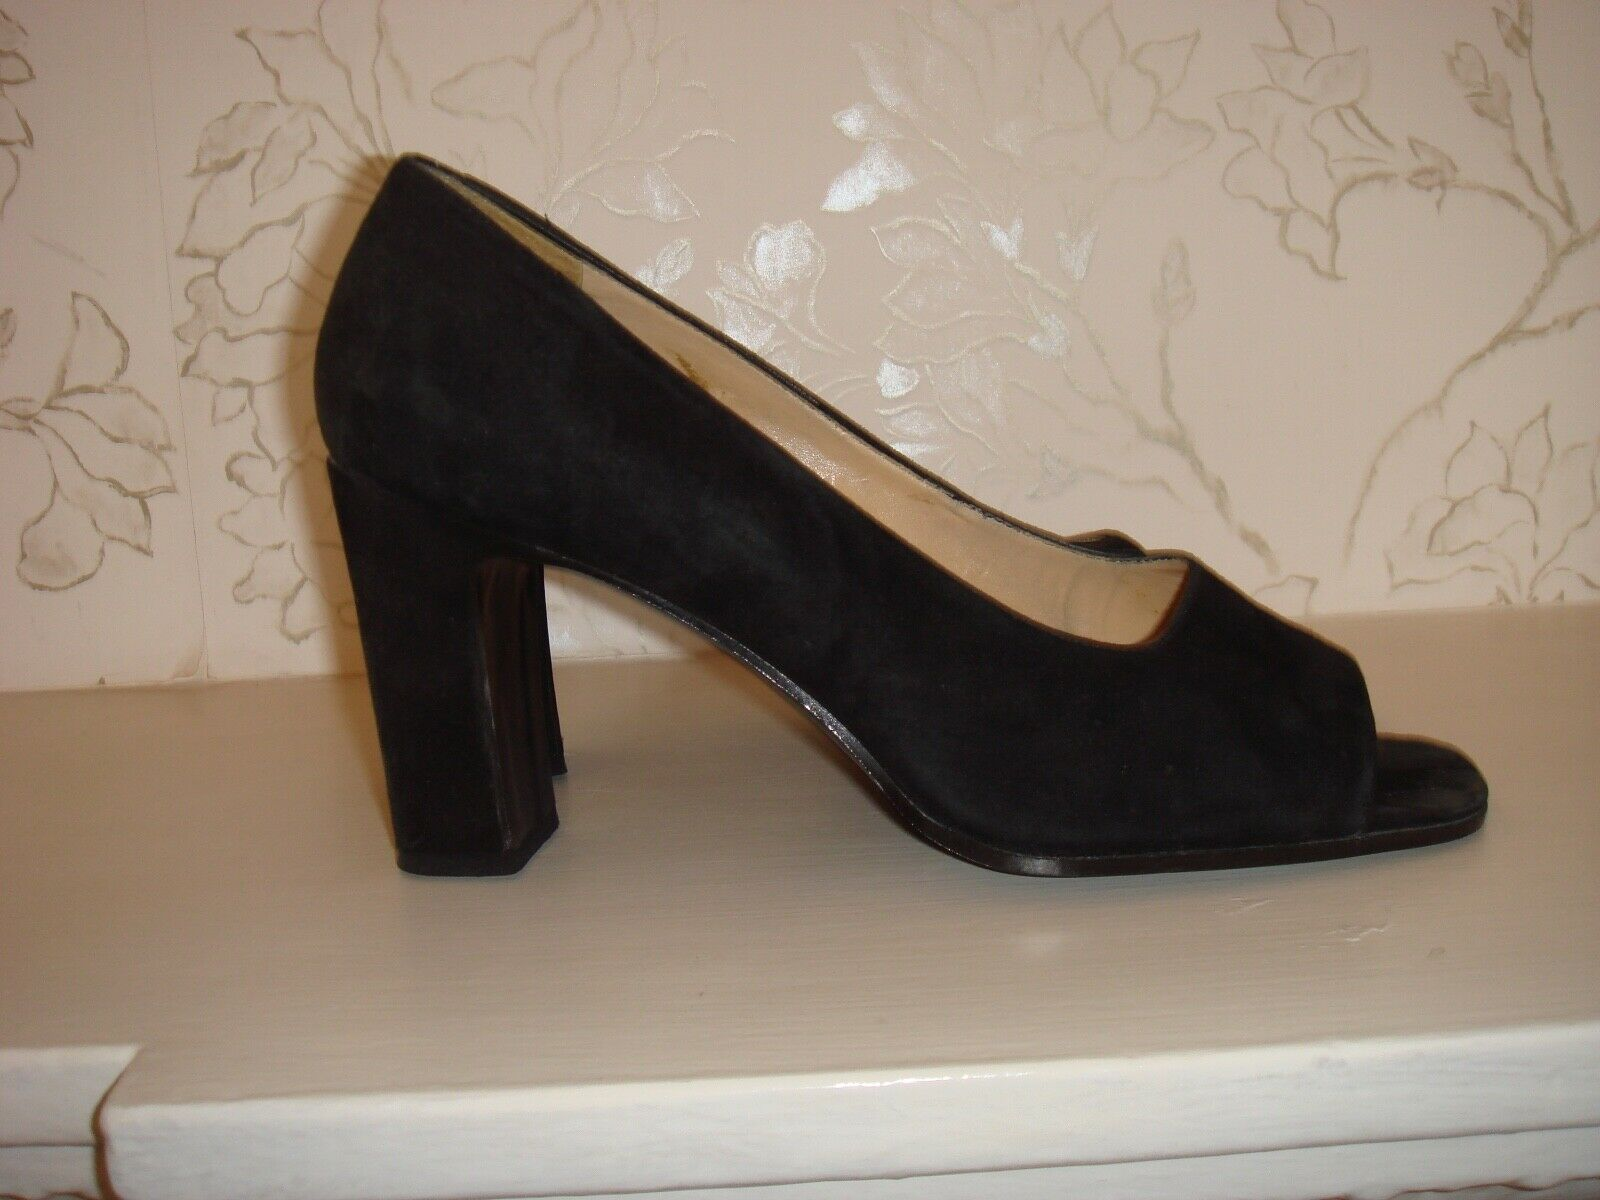 Women's Vintage Nine West Black Suede Open Toe shoes Heels 7 1 2 M UK 5 Brazil